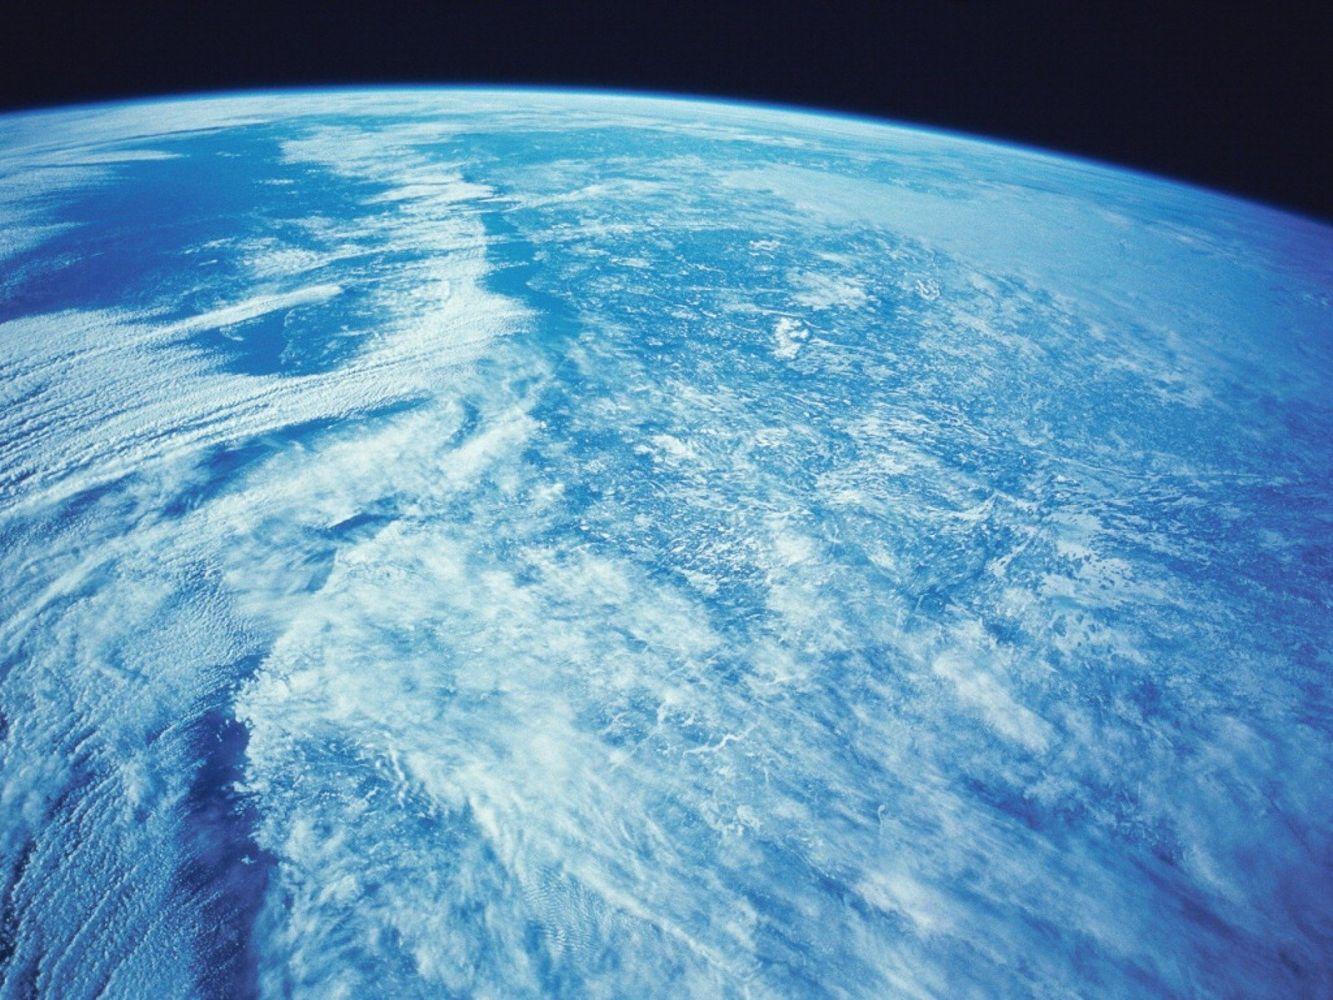 дом океан фото с космоса ваш макет